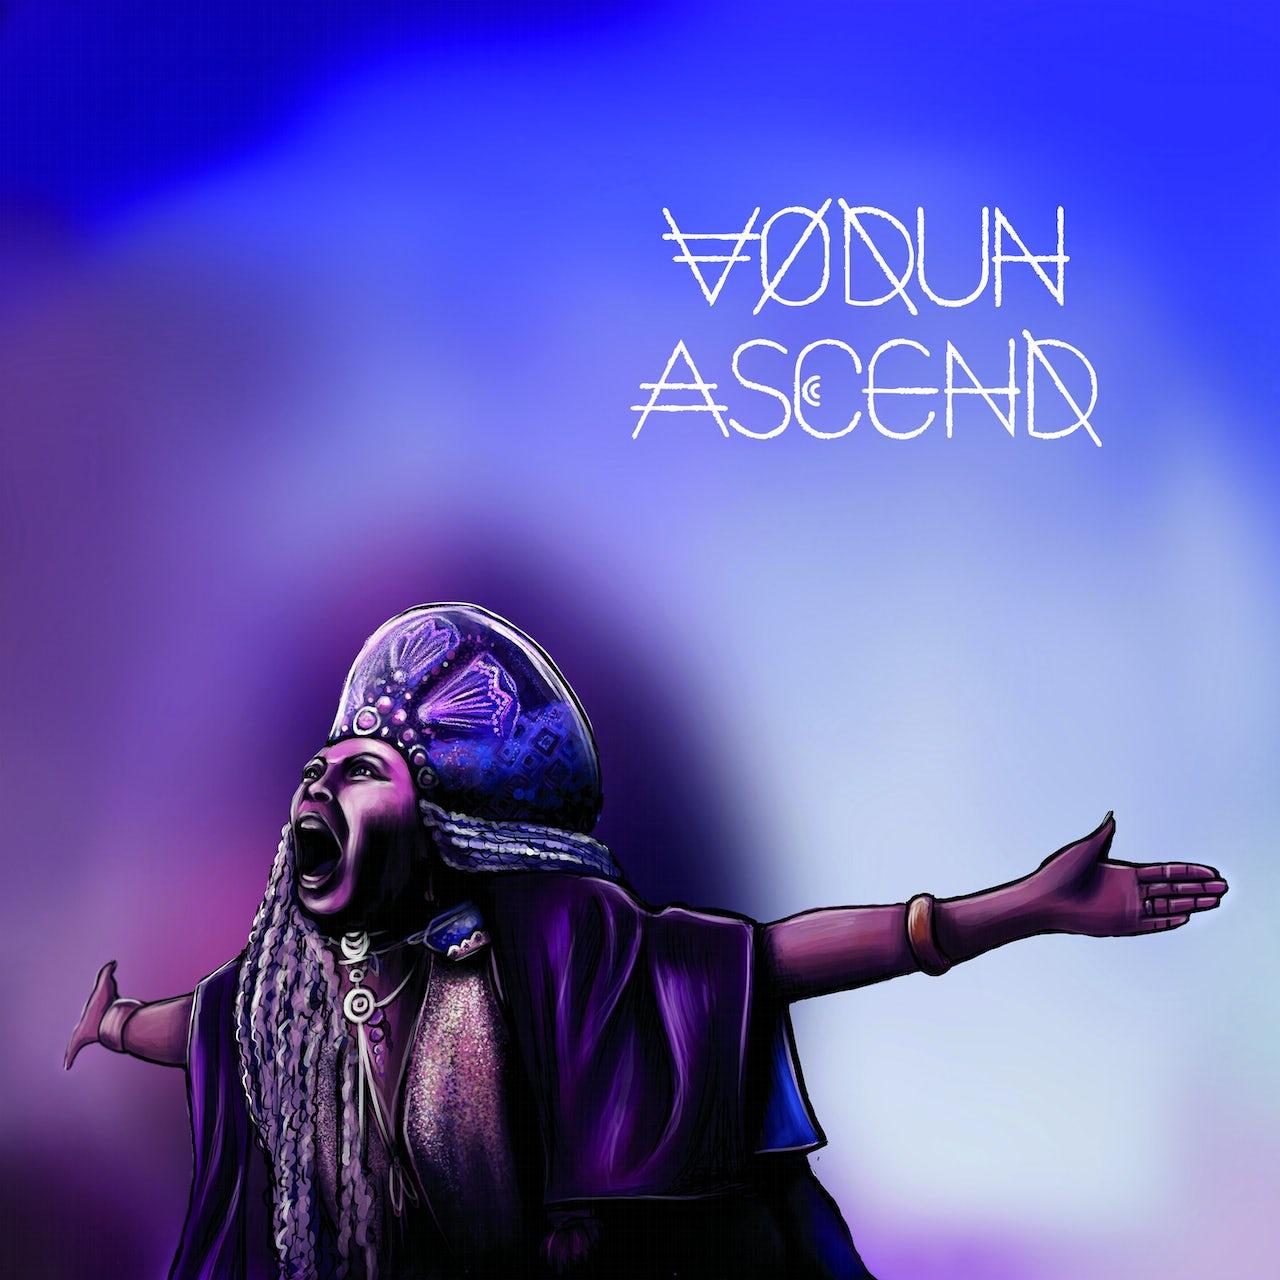 VODUN Ascend' Vinyl Record